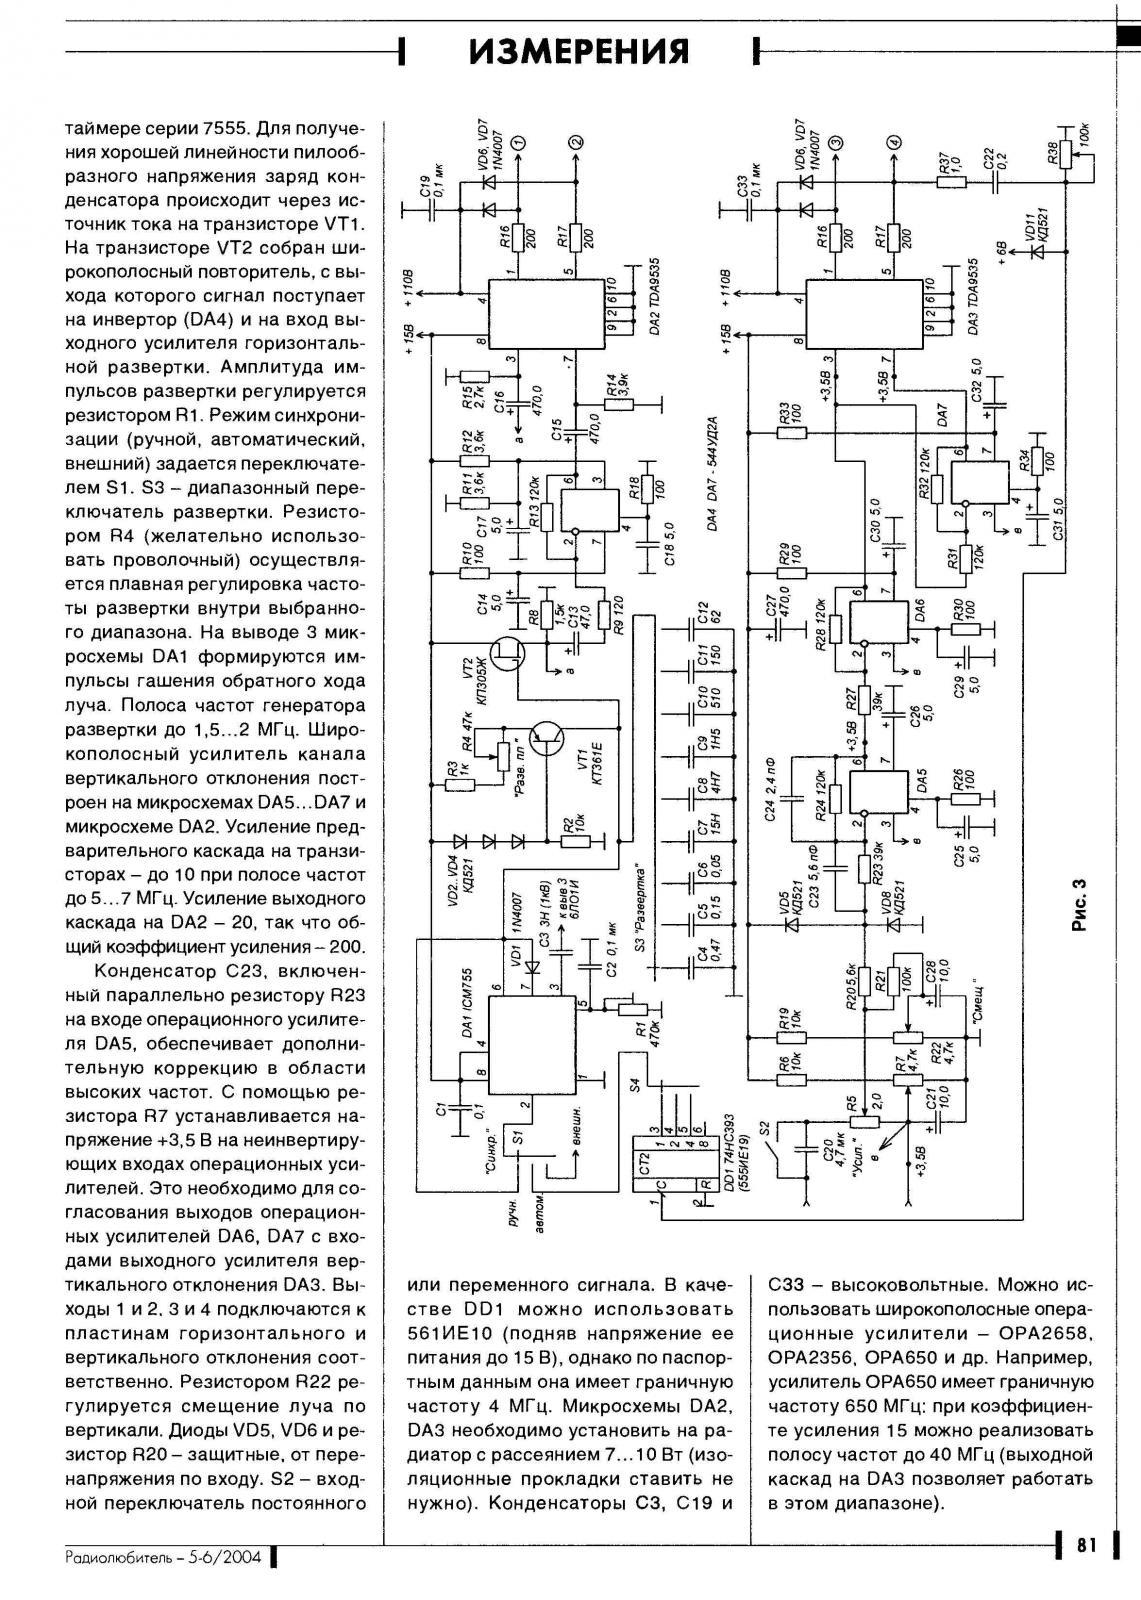 Ремонт осциллографов своими руками 879